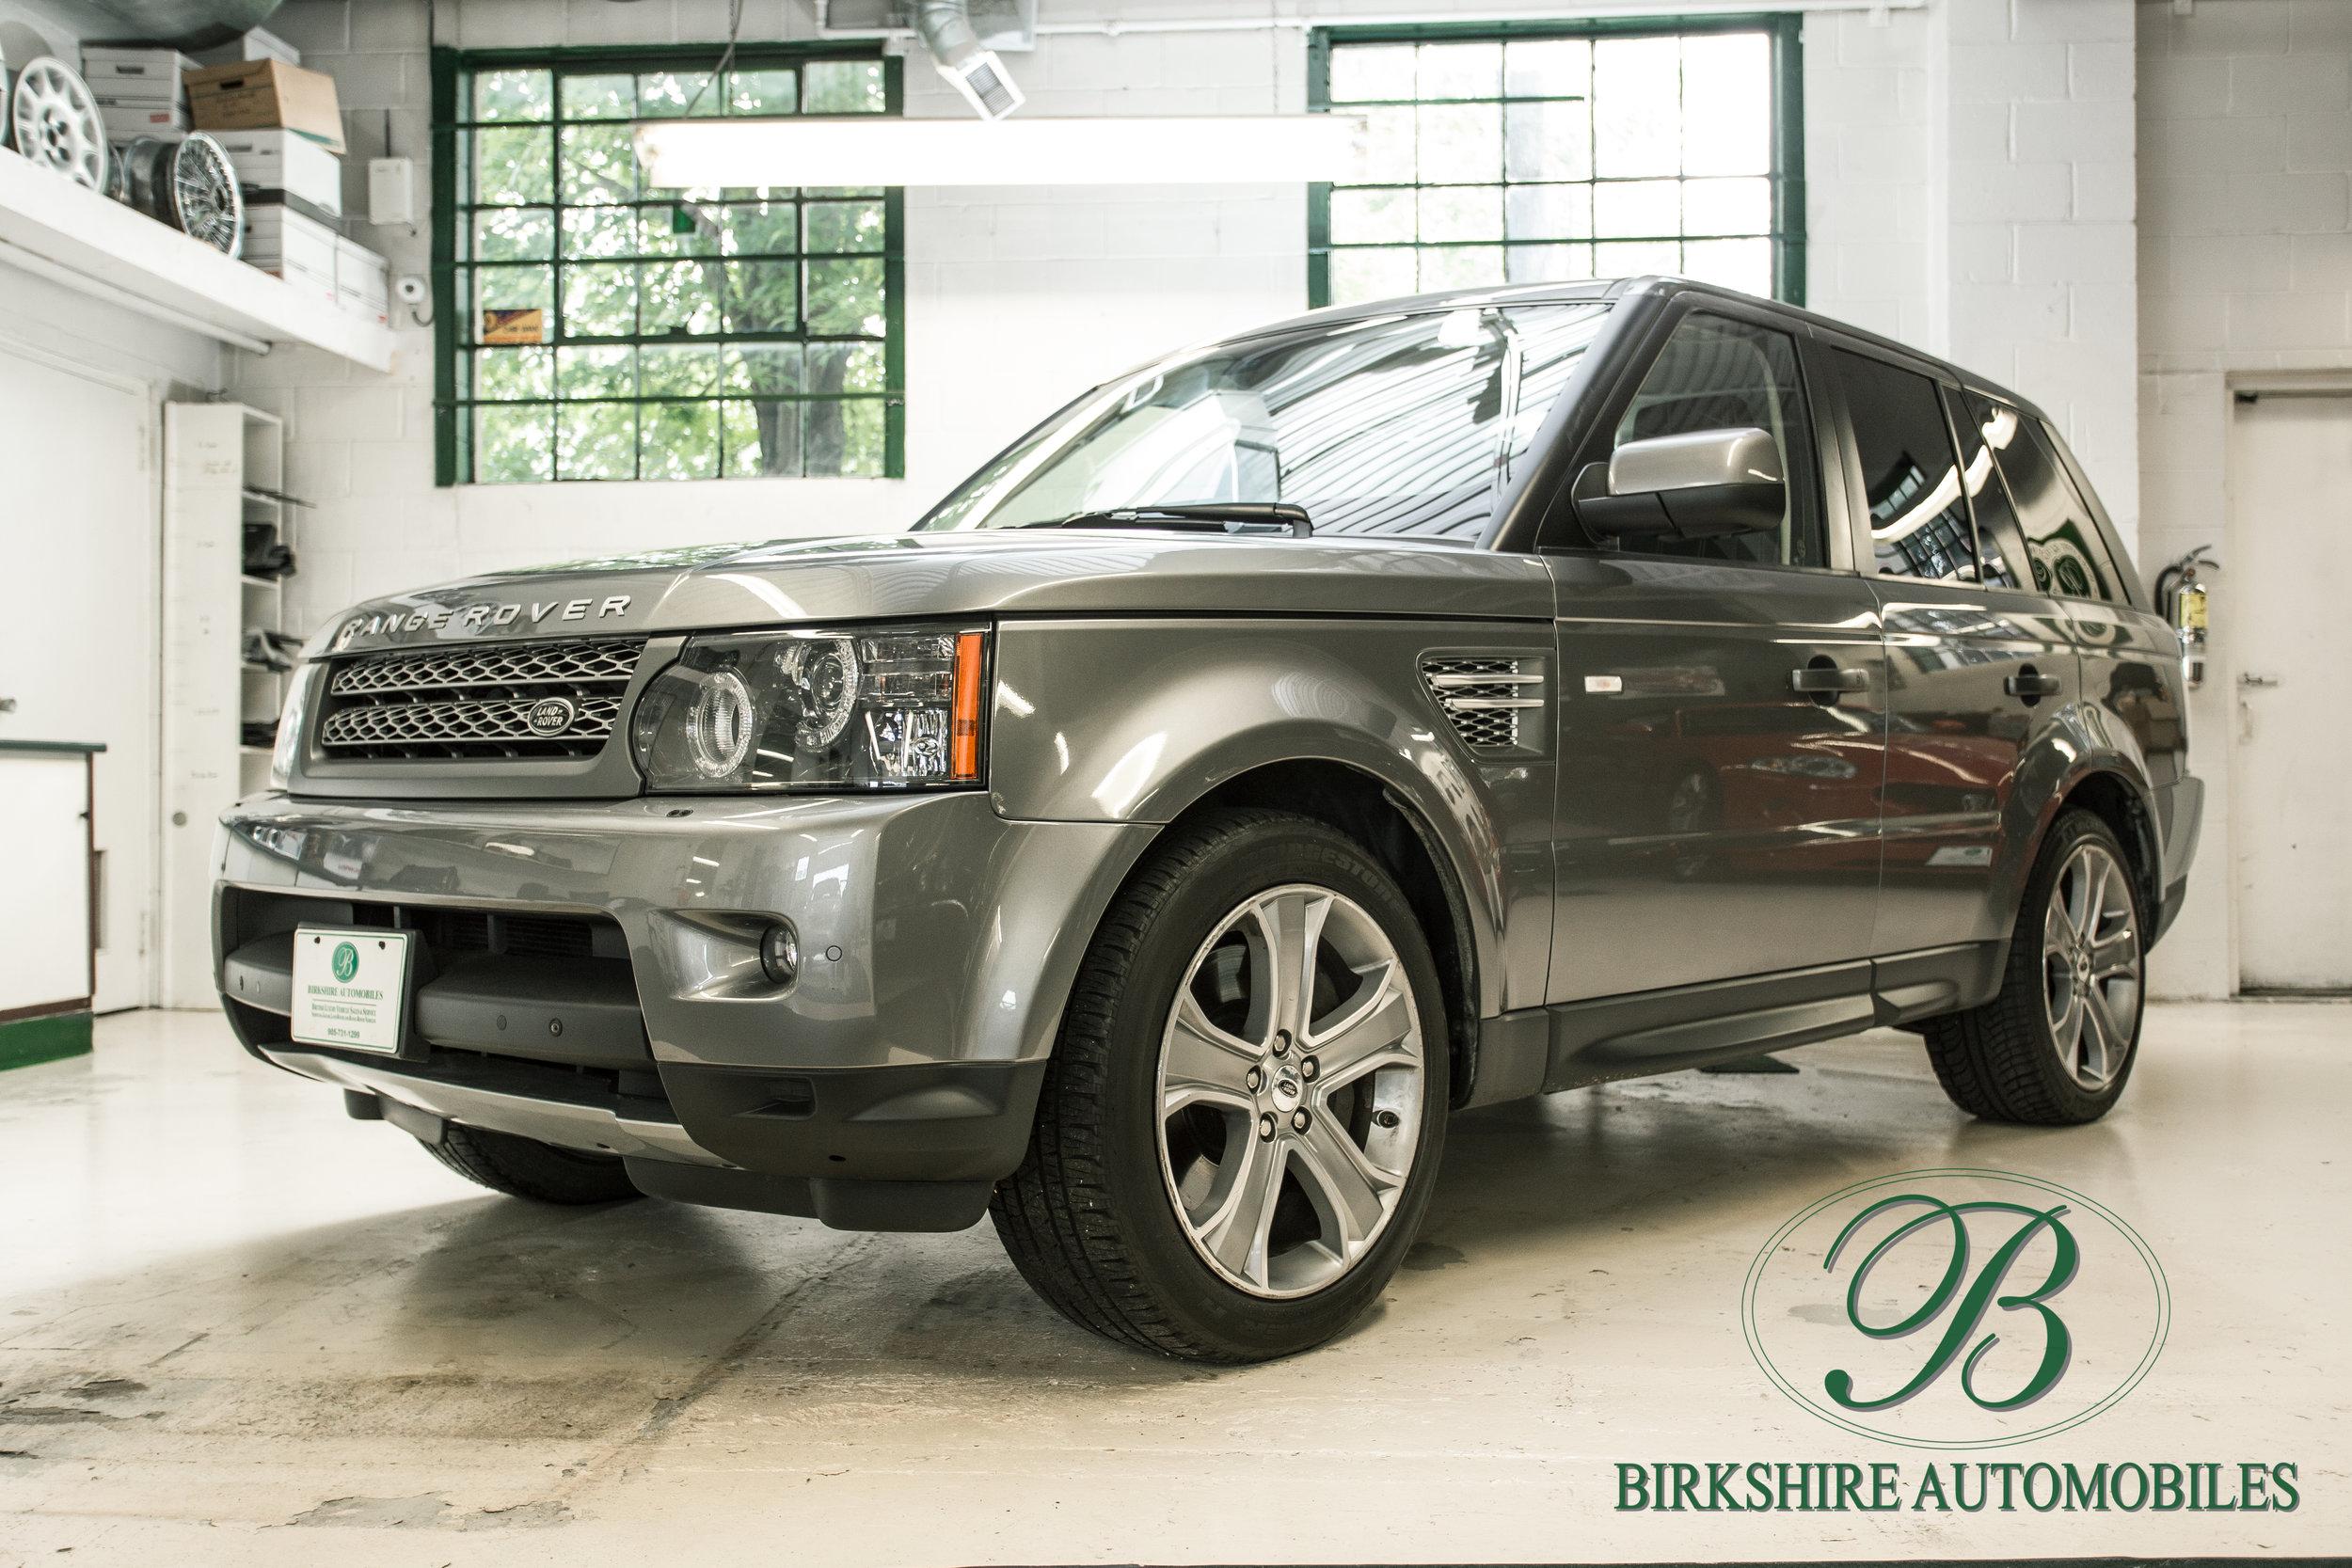 Birkshire Automobiles-5.jpg